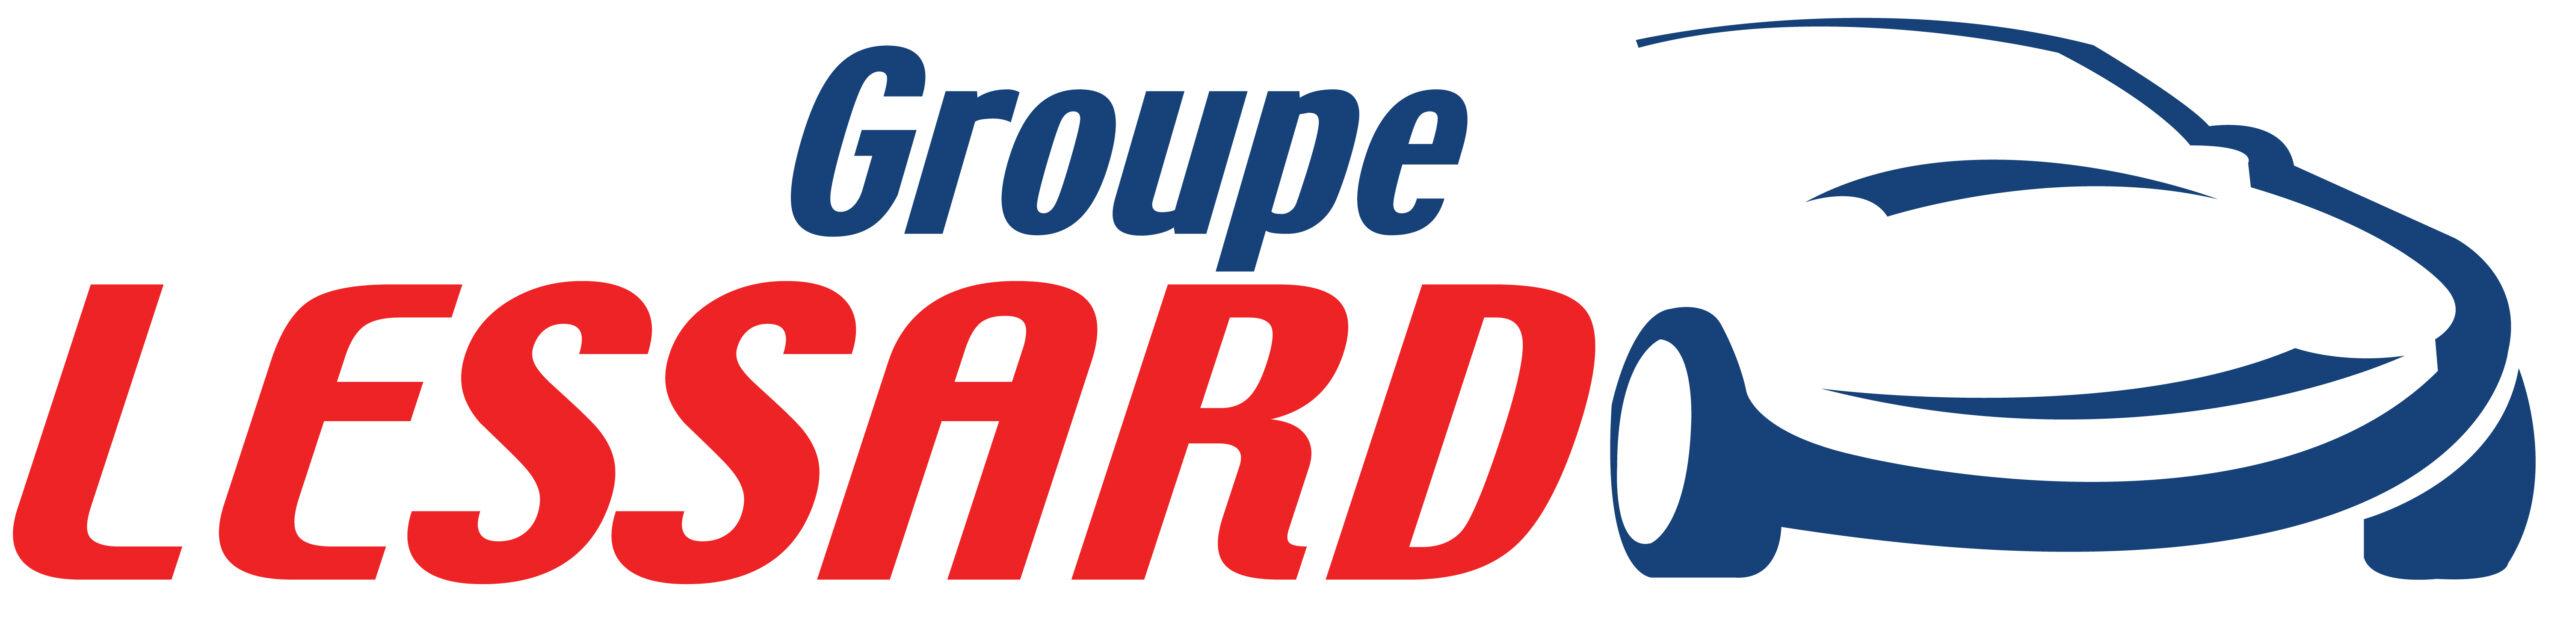 Groupe Lessard